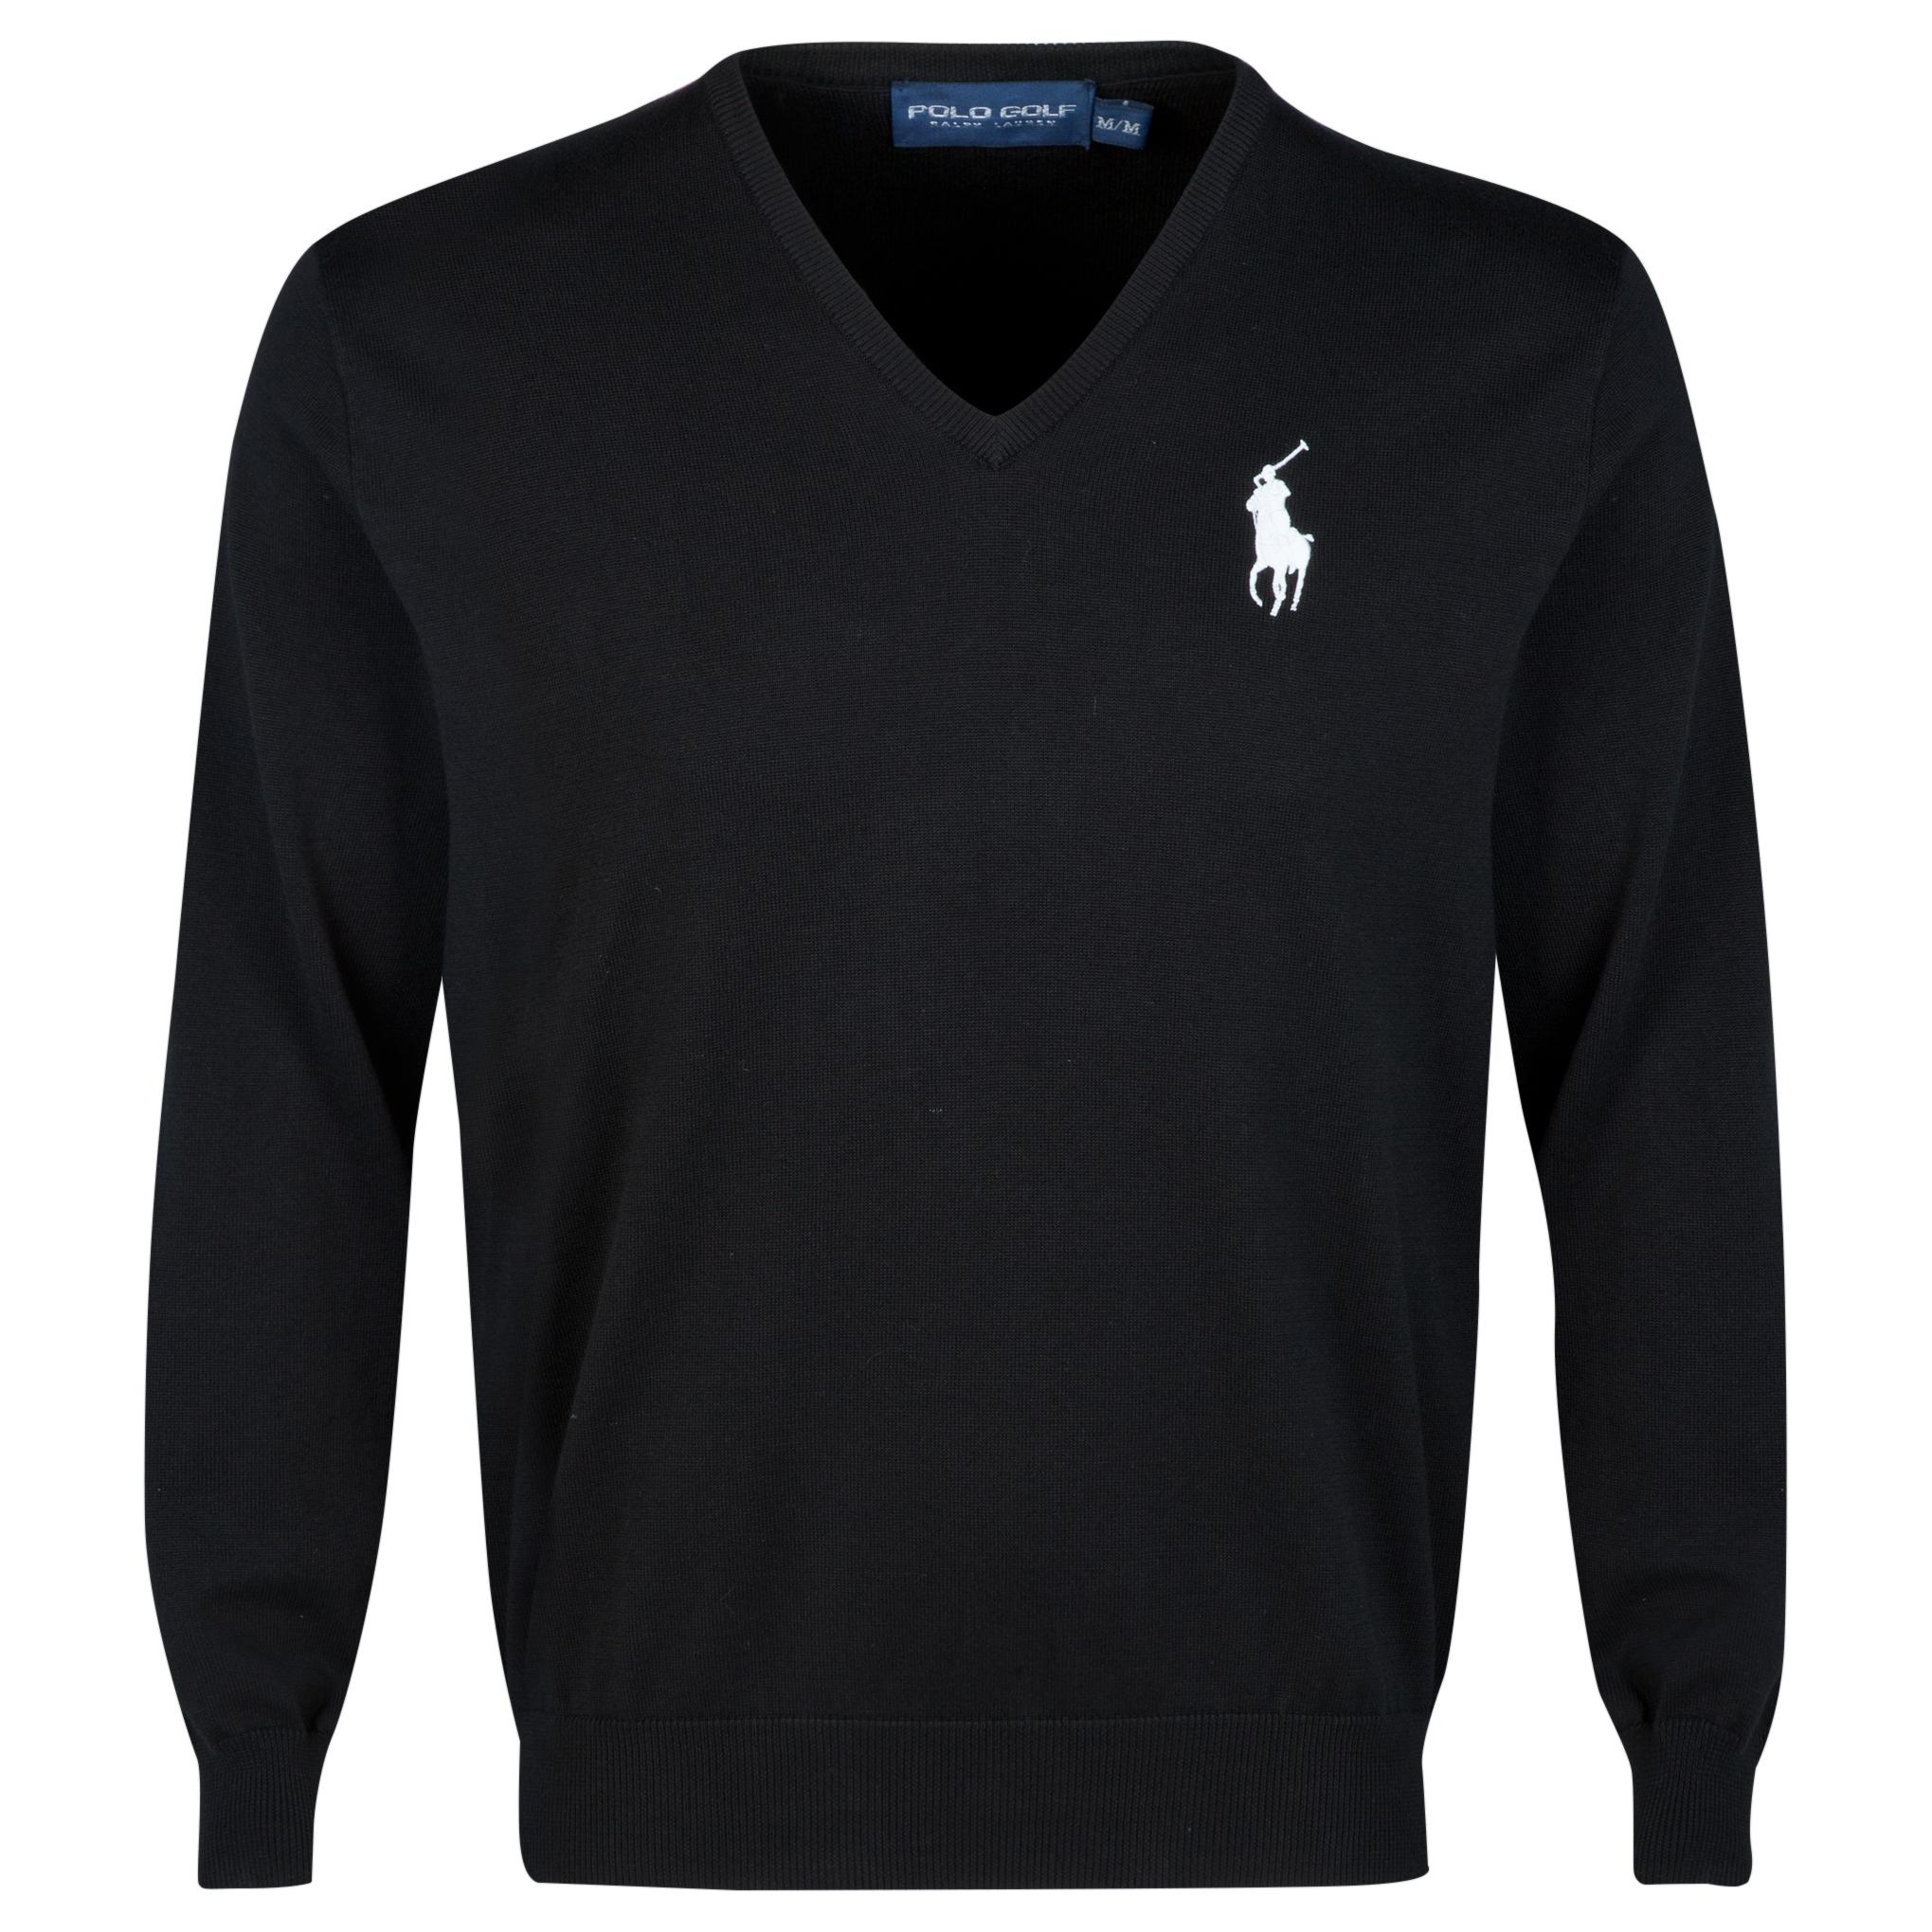 The 2014 Ryder Cup Ralph Lauren Big Pony V-Neck Sweater Black